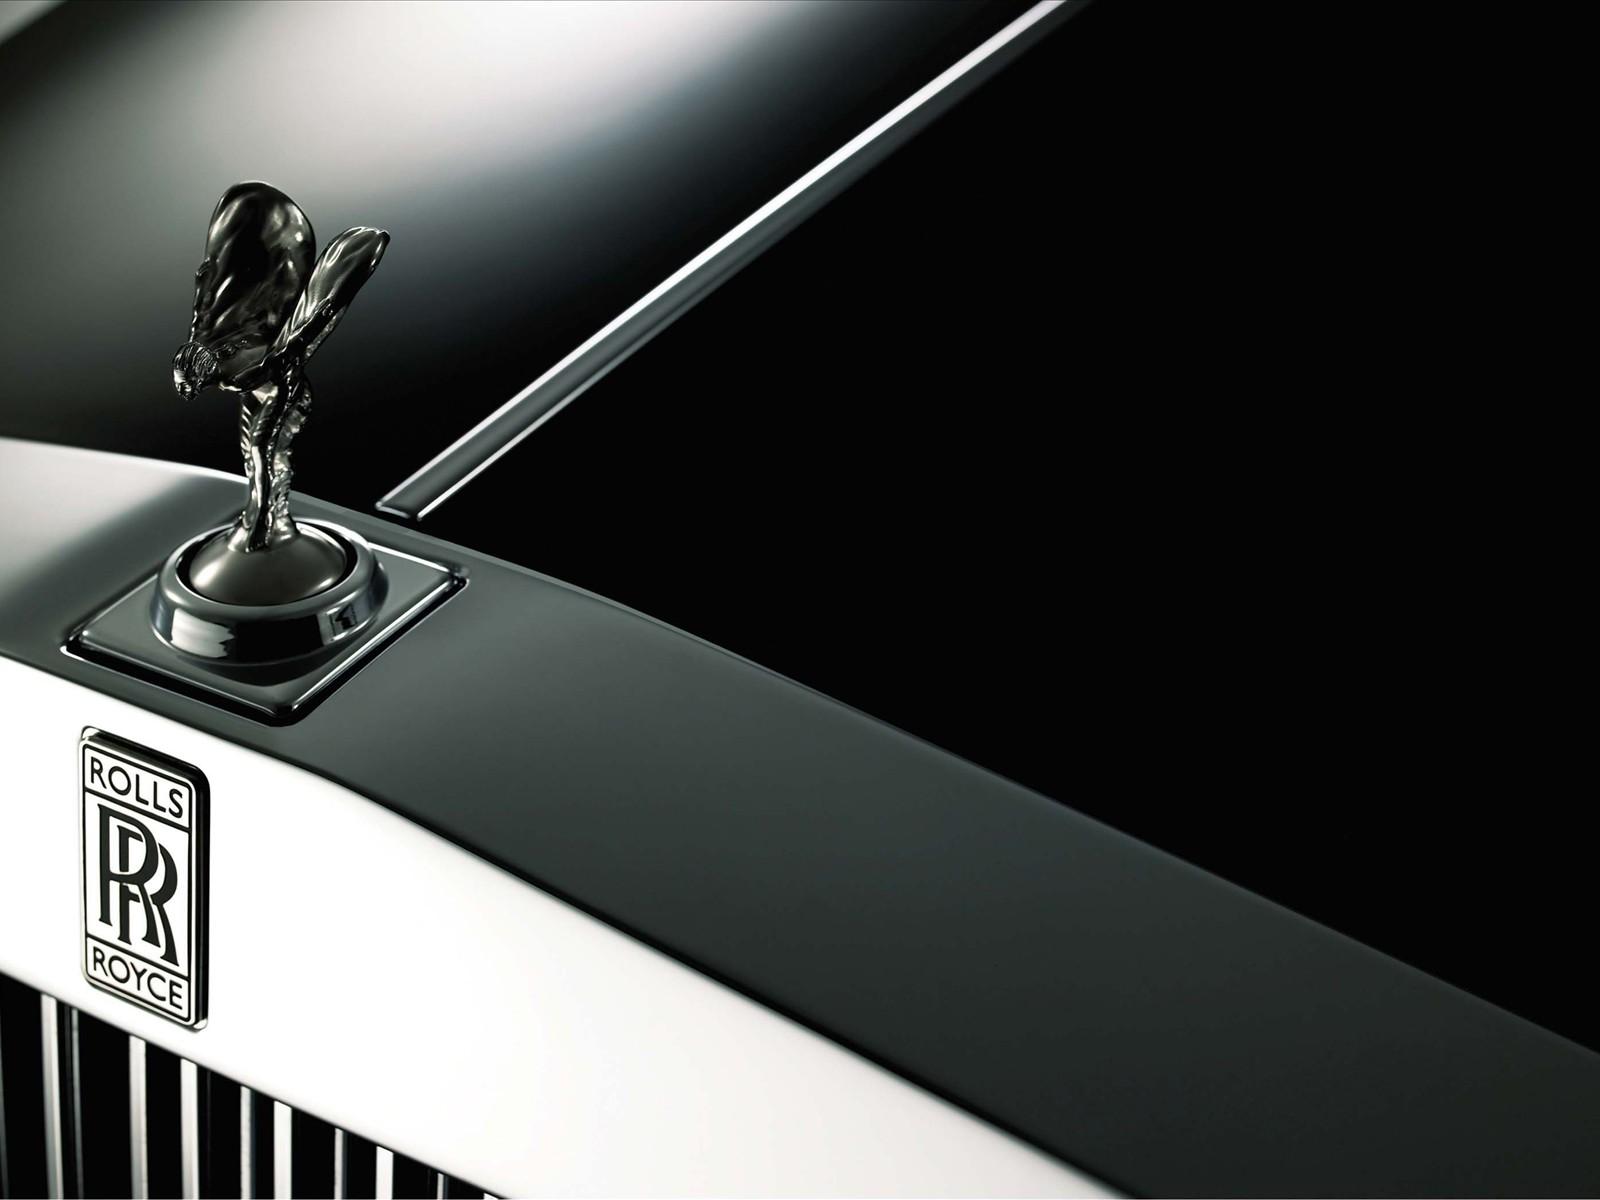 Rolls Royce Logo Auto Cars Concept